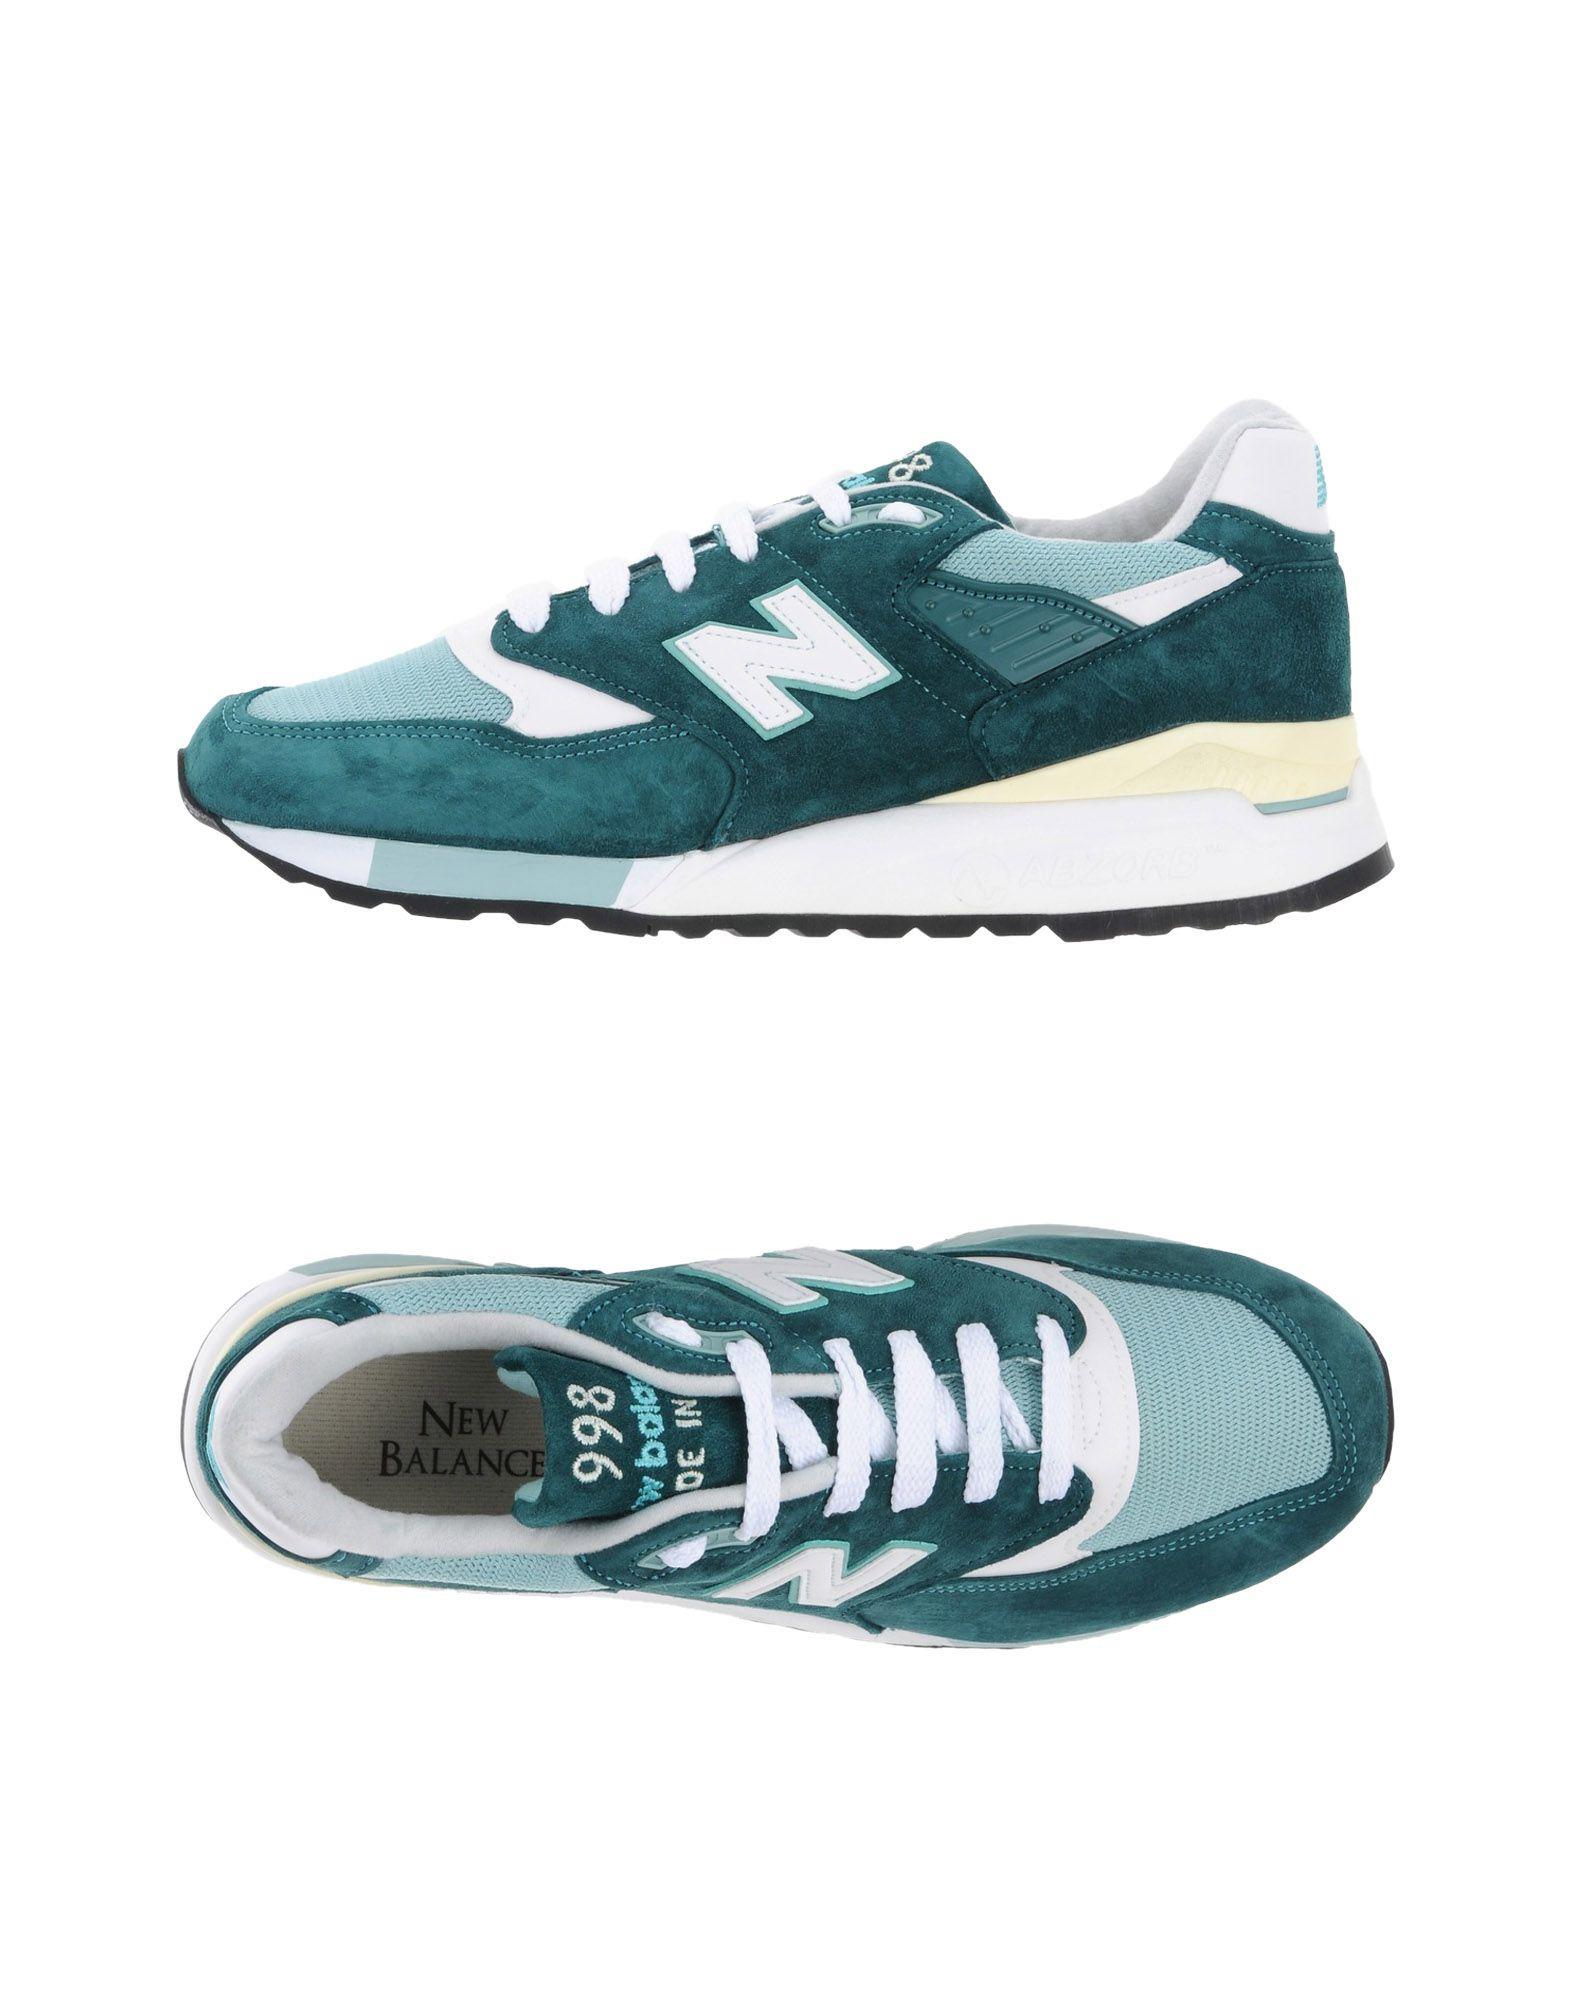 New Balance Sneakers Sneakers Sneakers Herren  11253384PK 451dab